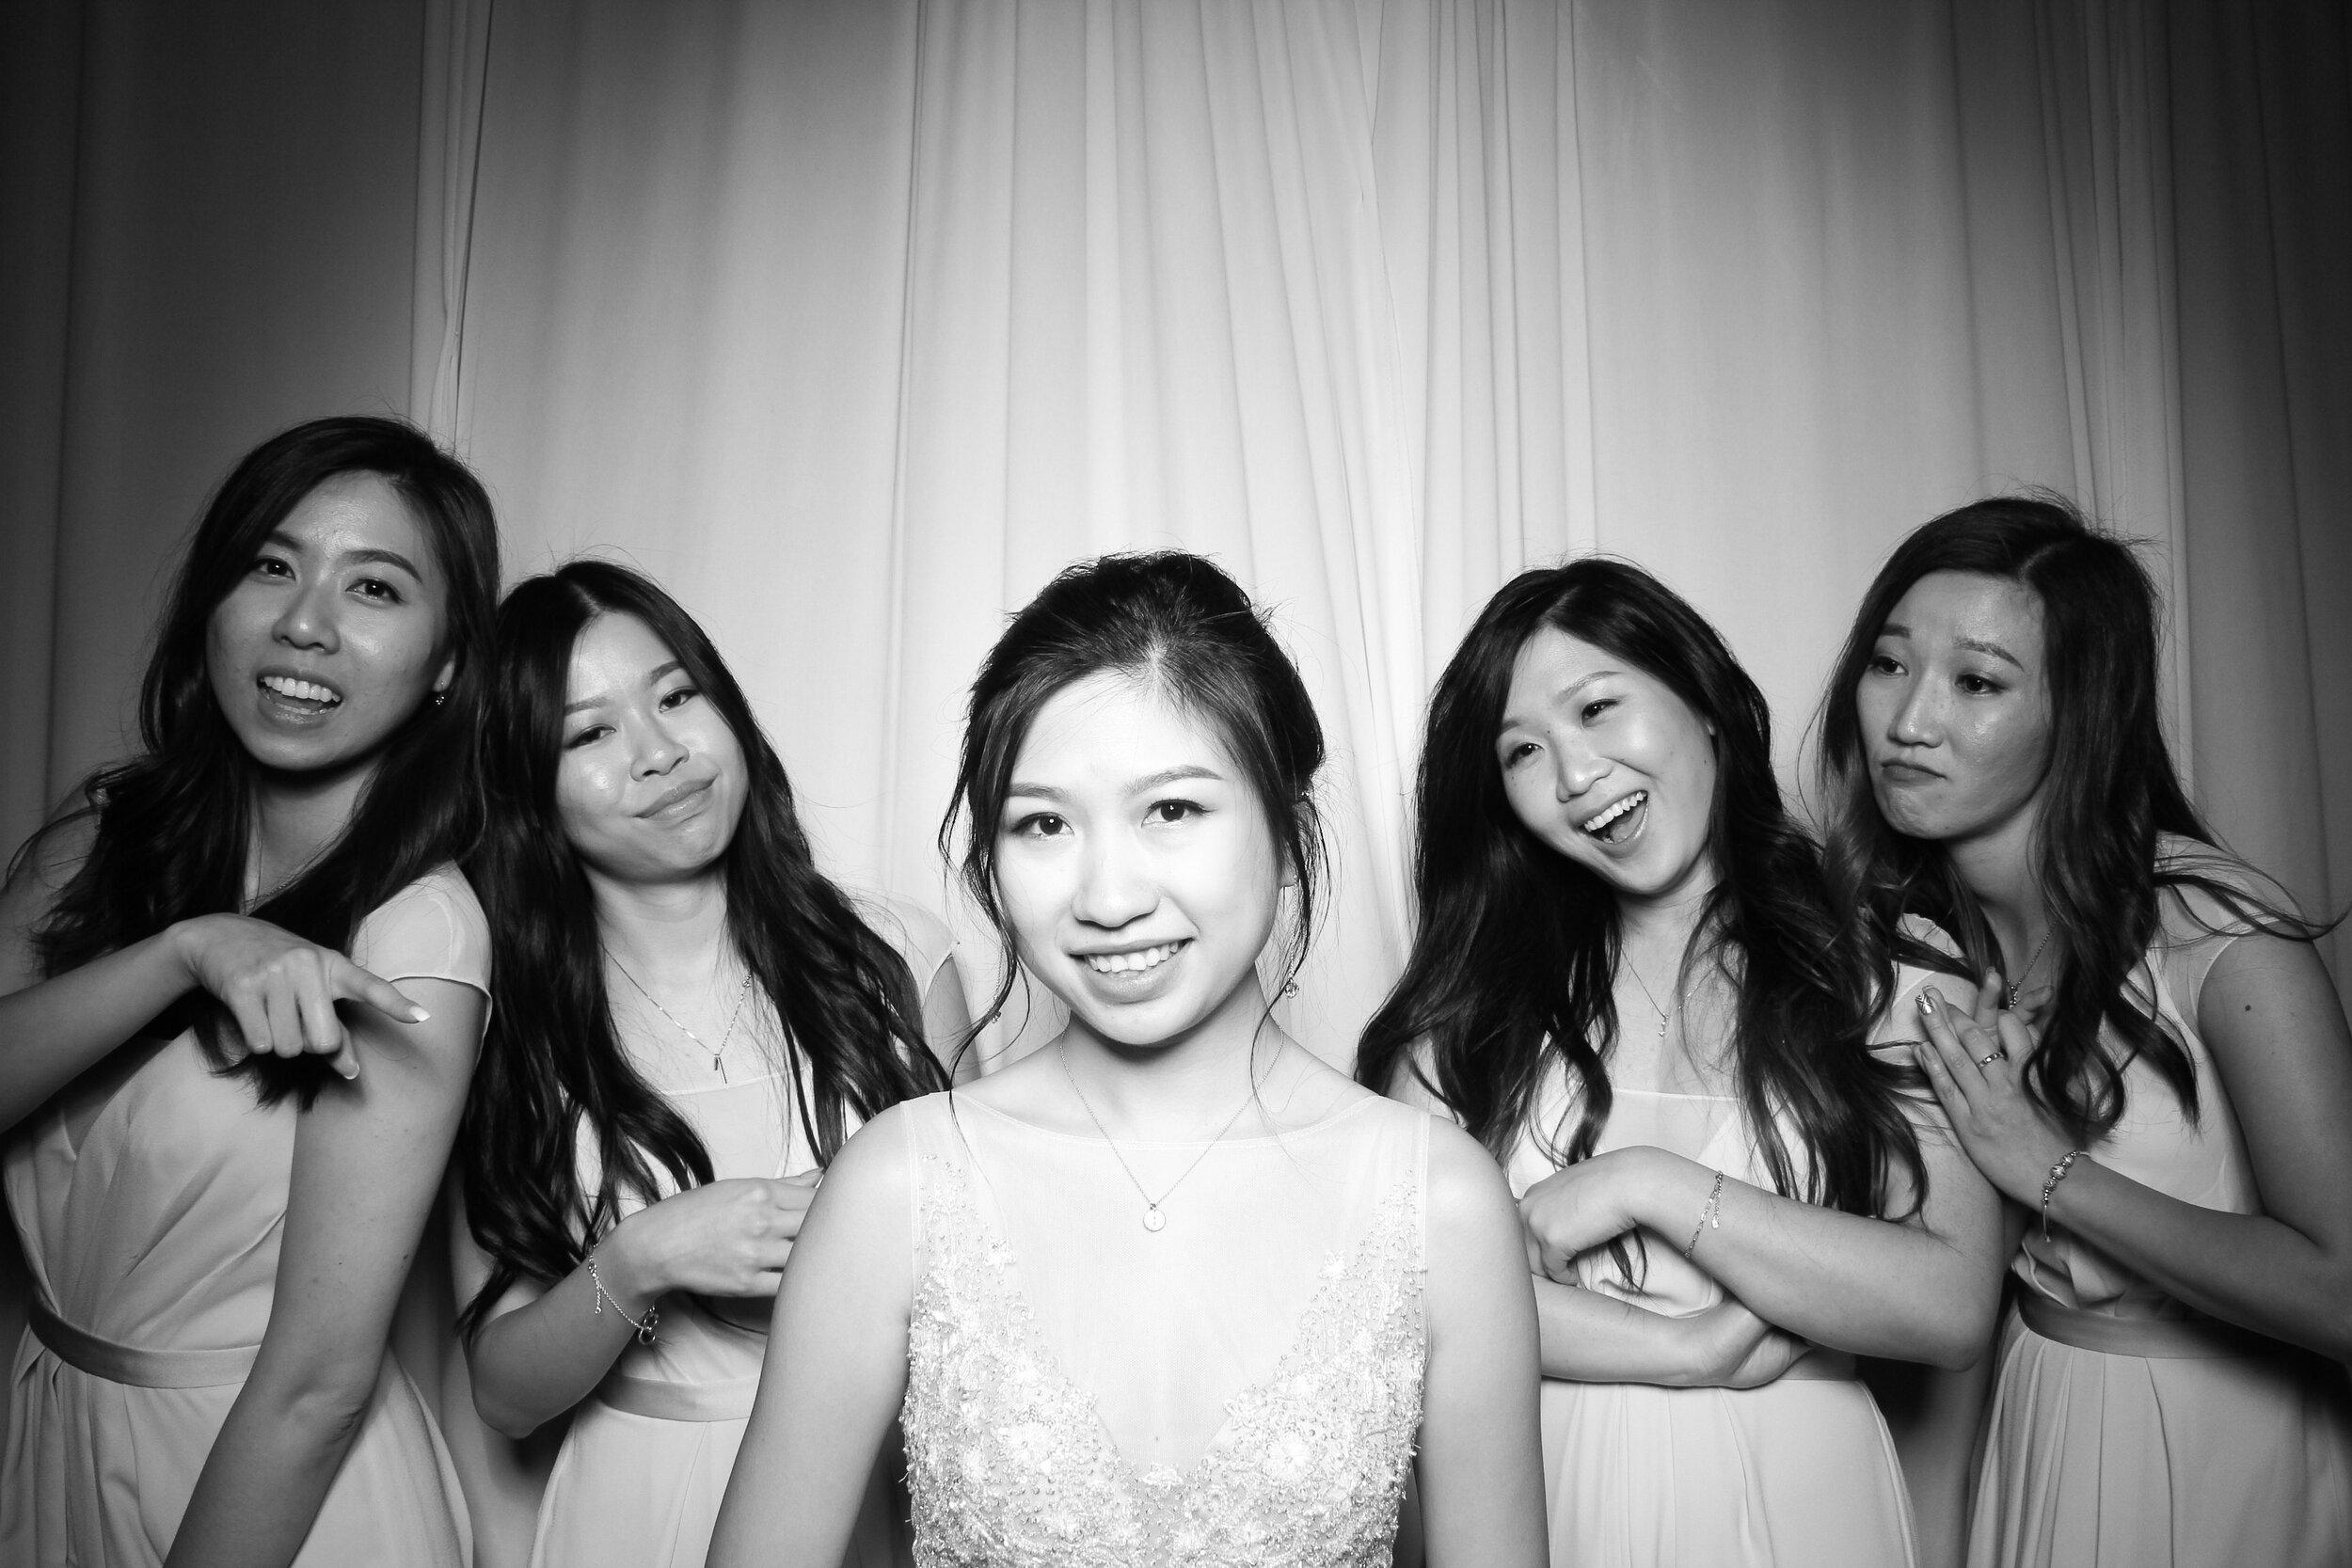 Cai_Restaurant_Chinatown_Chicago_Wedding_Photo_Booth_01.jpg